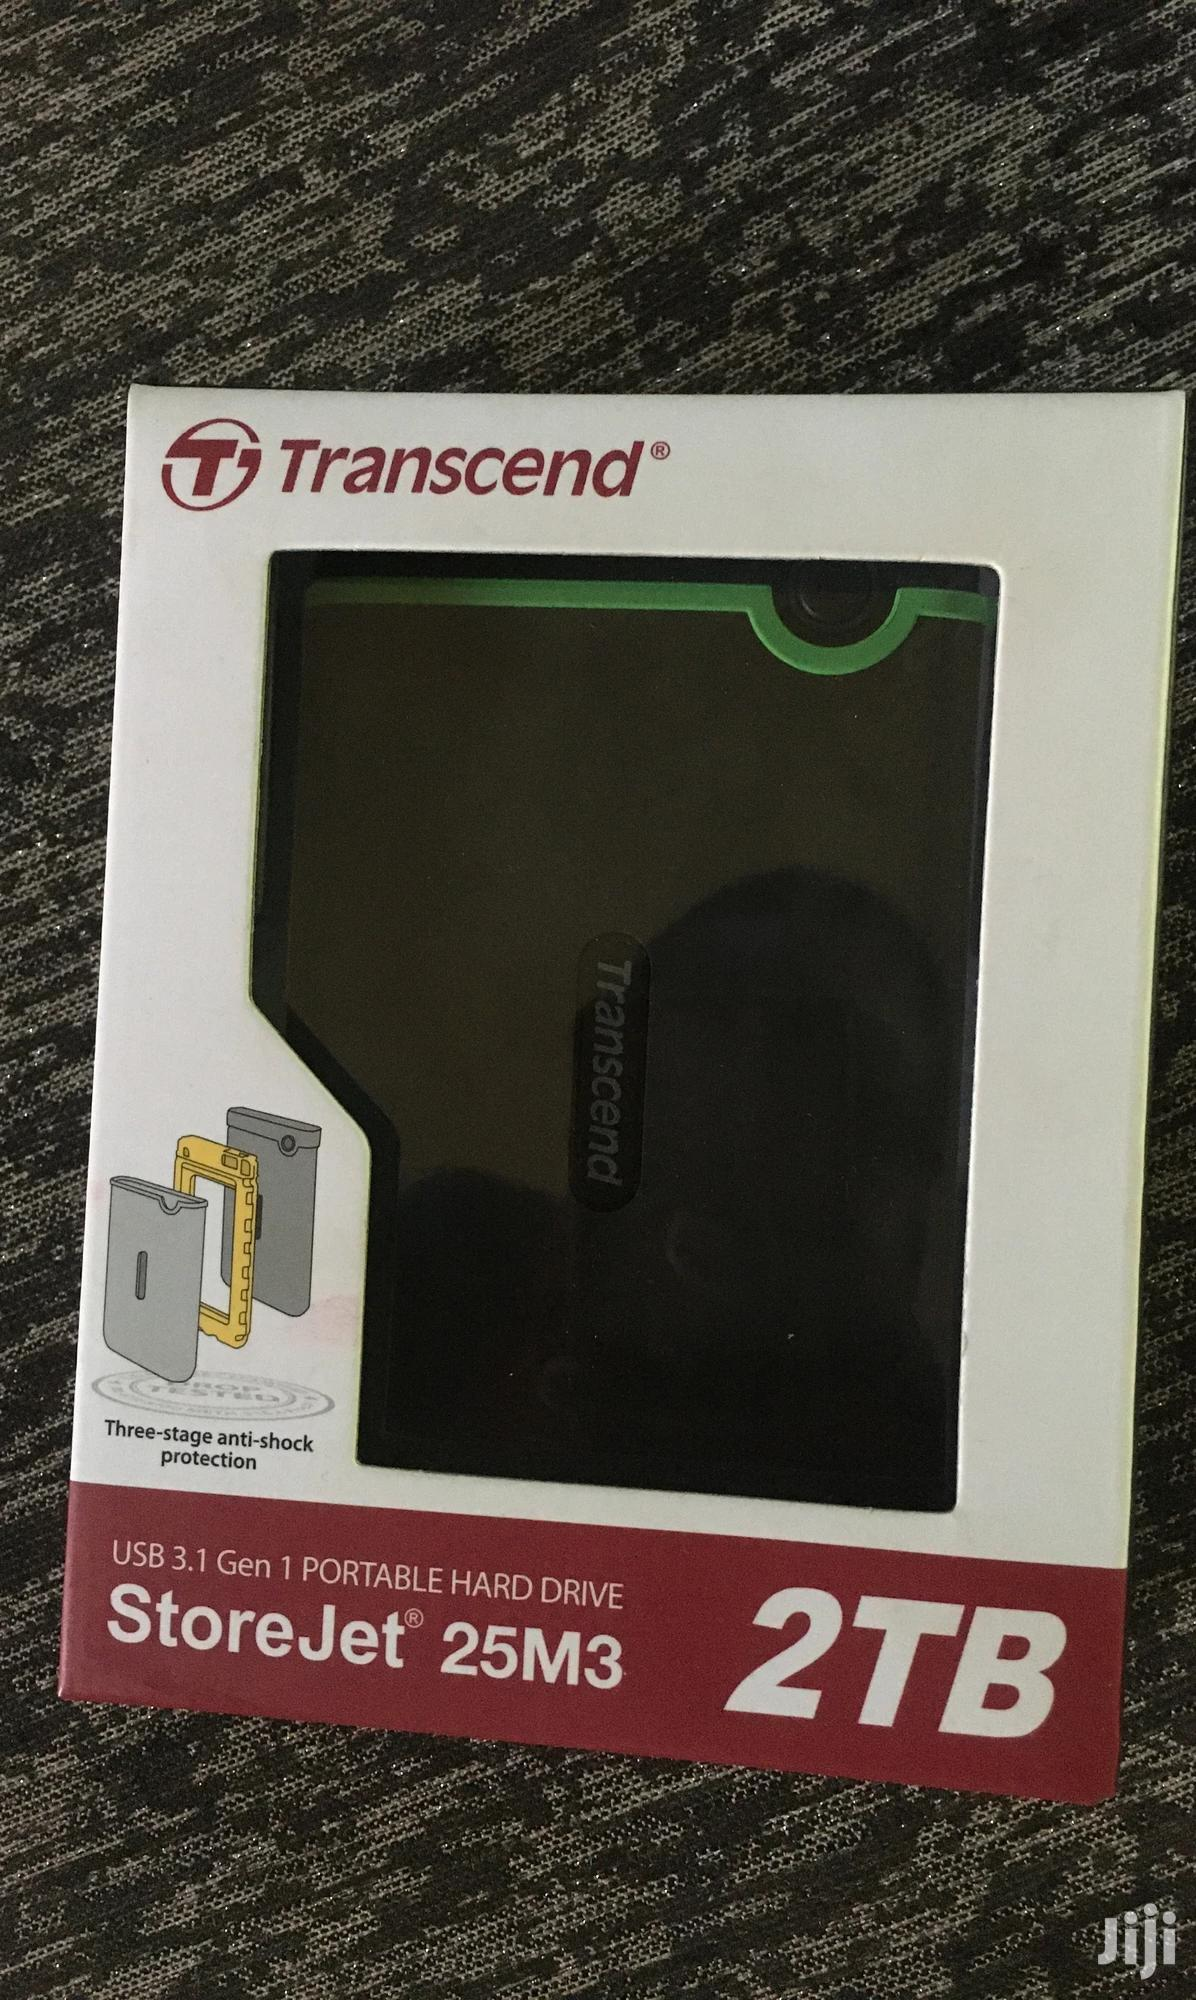 Transcend External Hard Drive 2TB